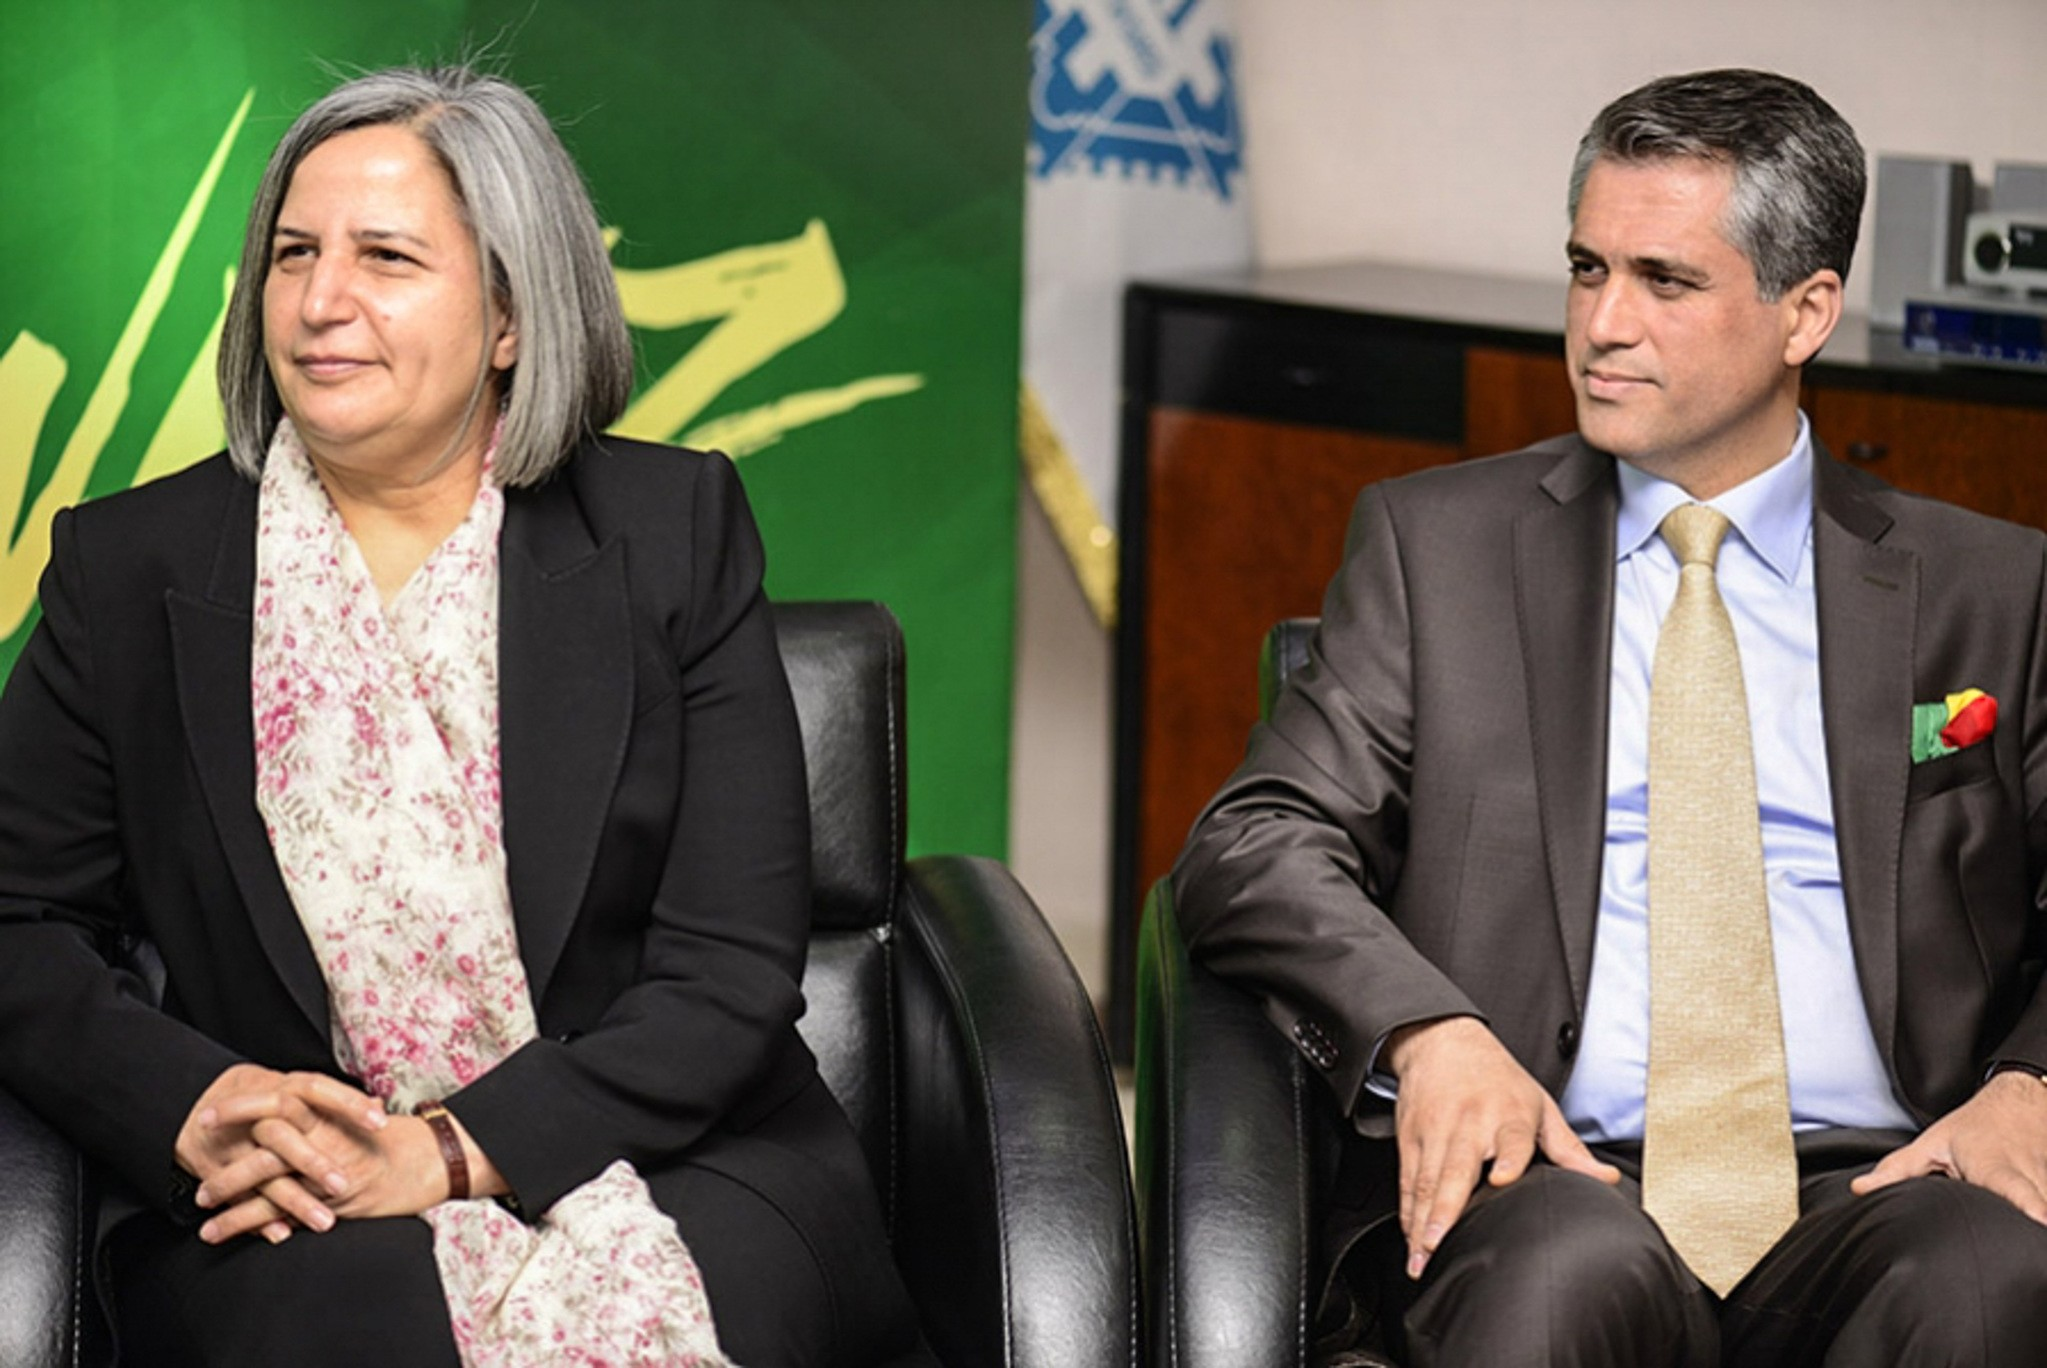 Two co-mayors Gu00fcltan Ku0131u015fanak (L) and Fu0131rat Anlu0131 (R) during an event in Diyarbakir.